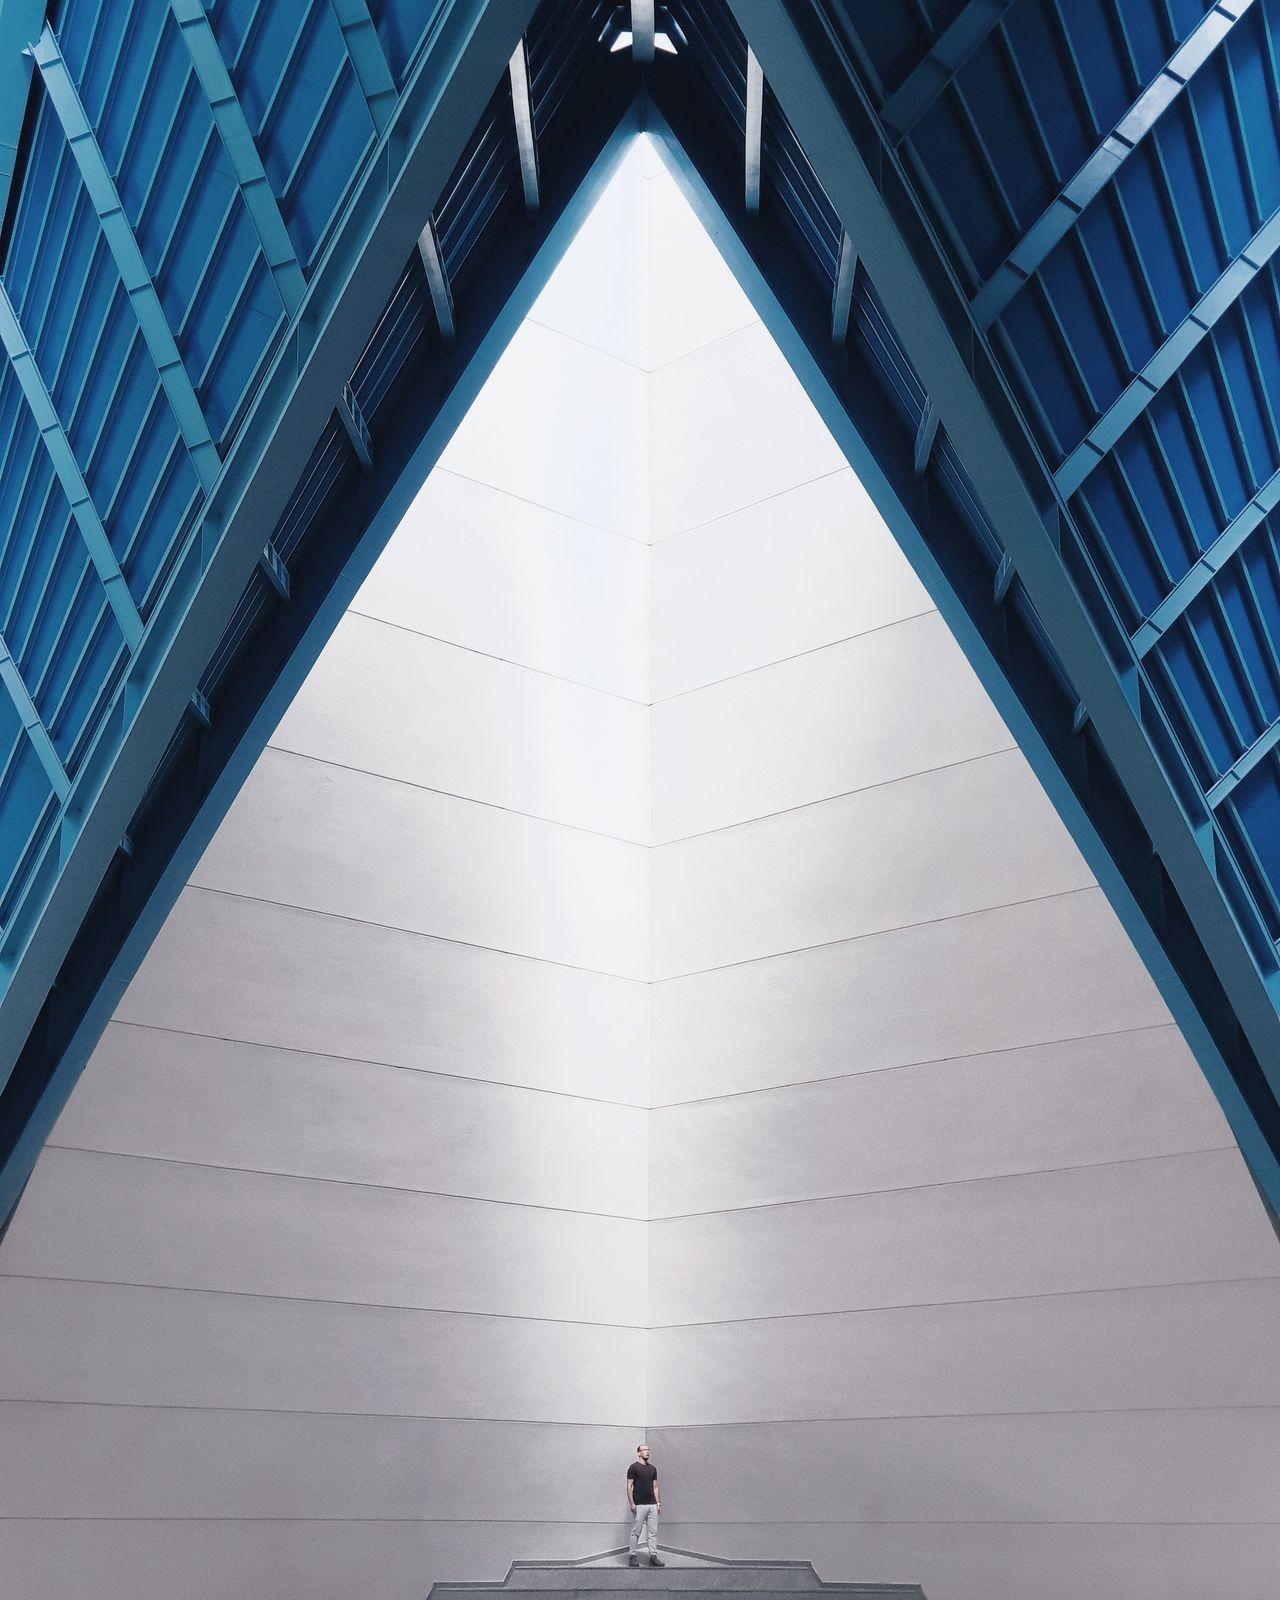 architecture, built structure, building exterior, building, day